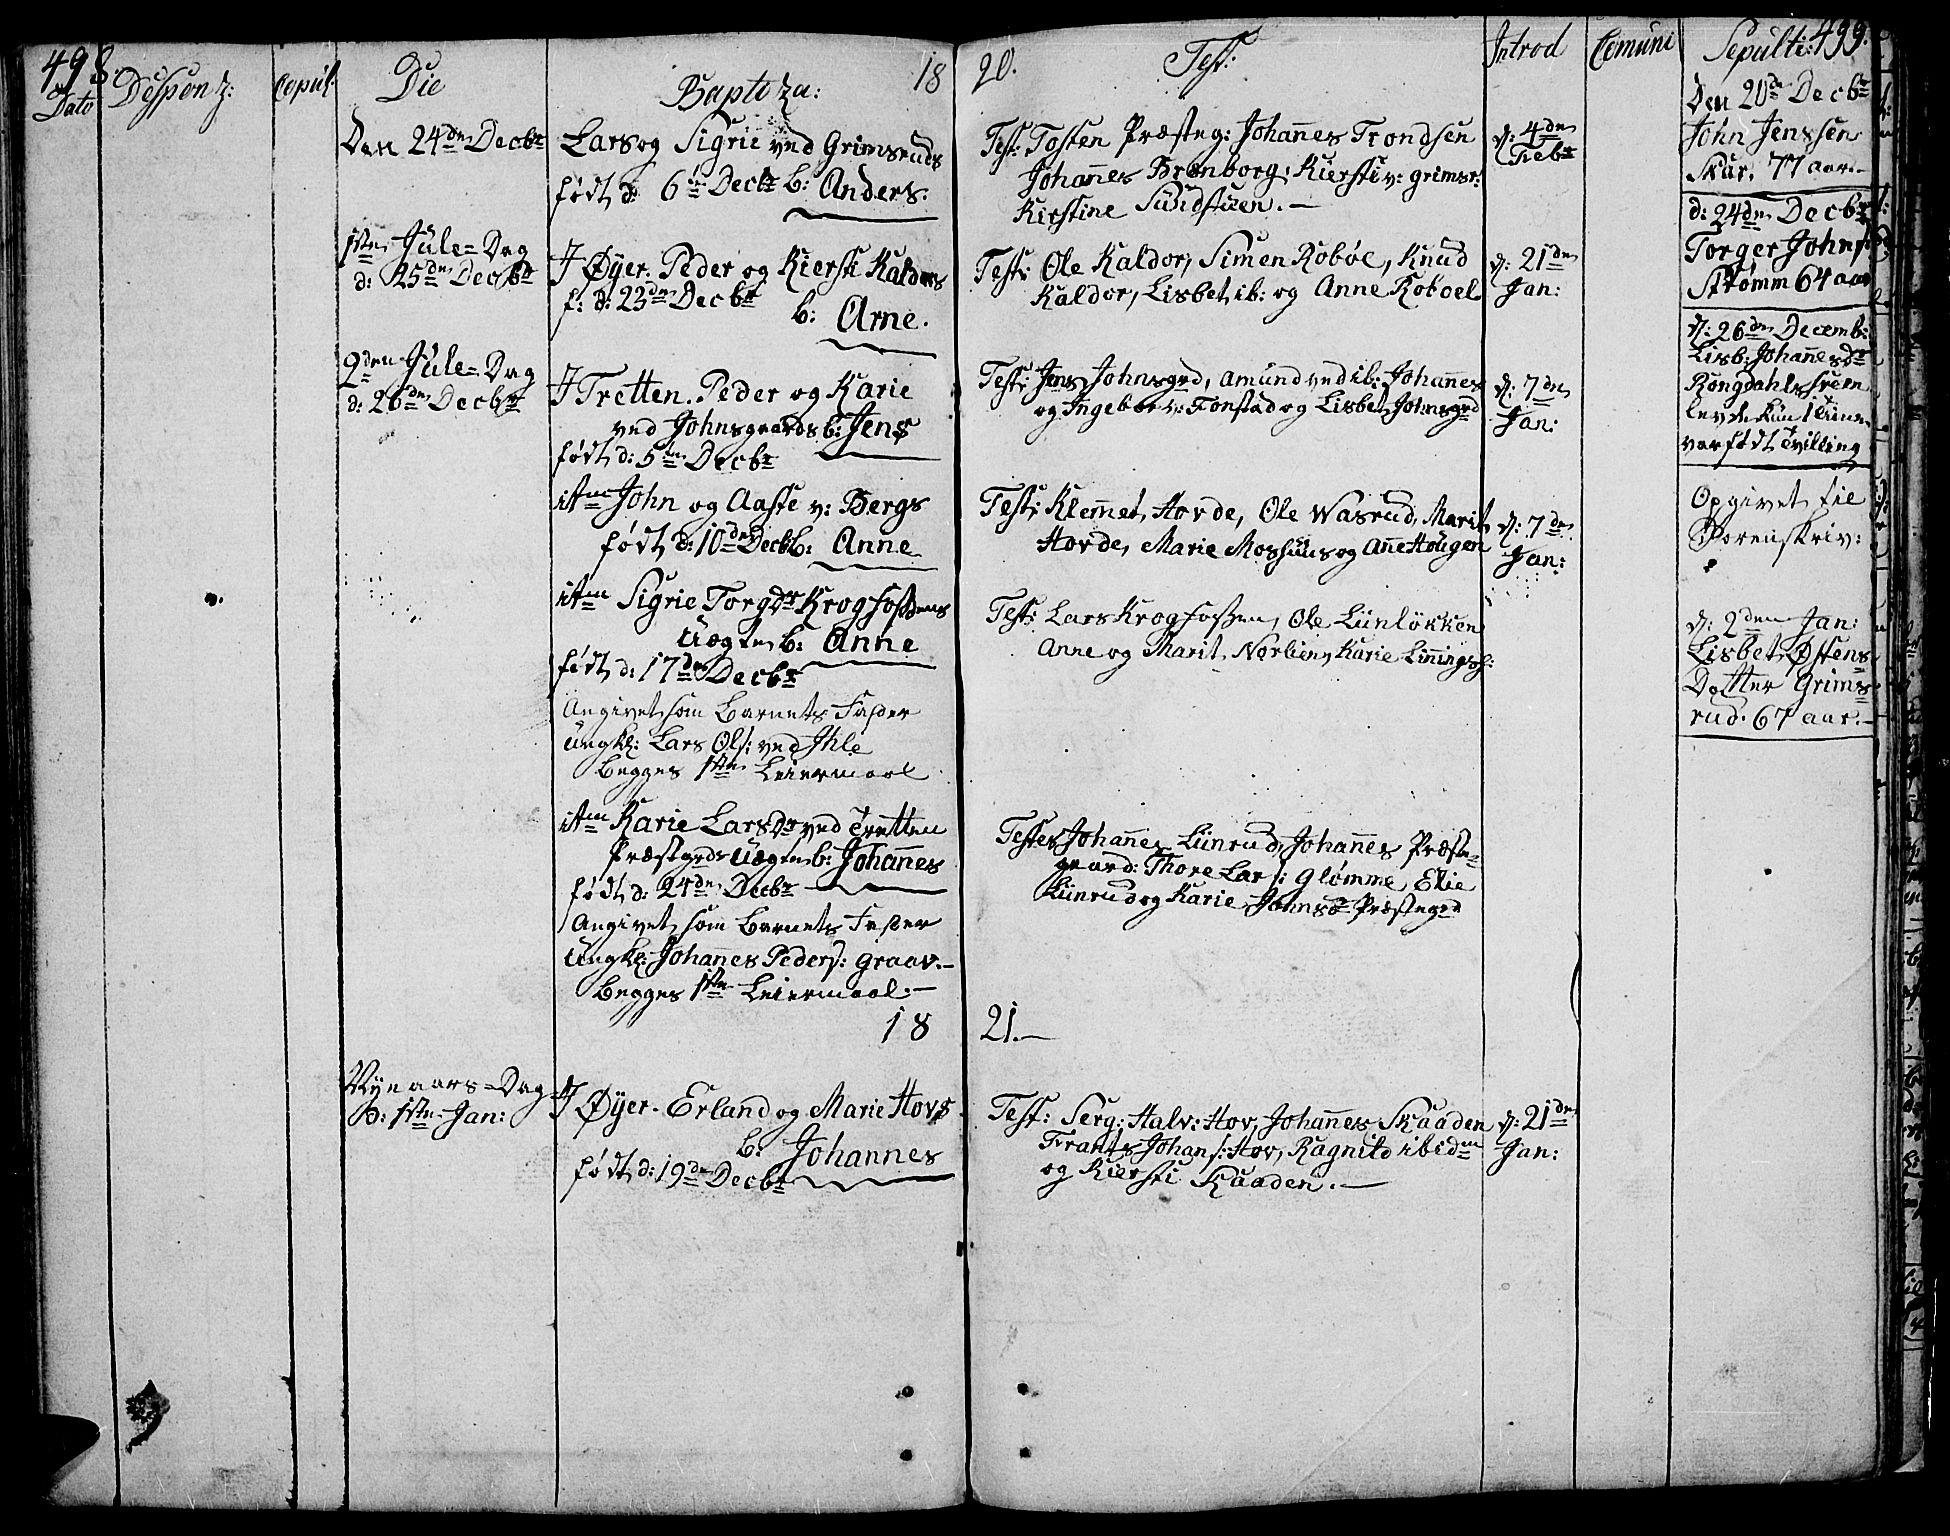 SAH, Øyer prestekontor, Ministerialbok nr. 3, 1784-1824, s. 498-499